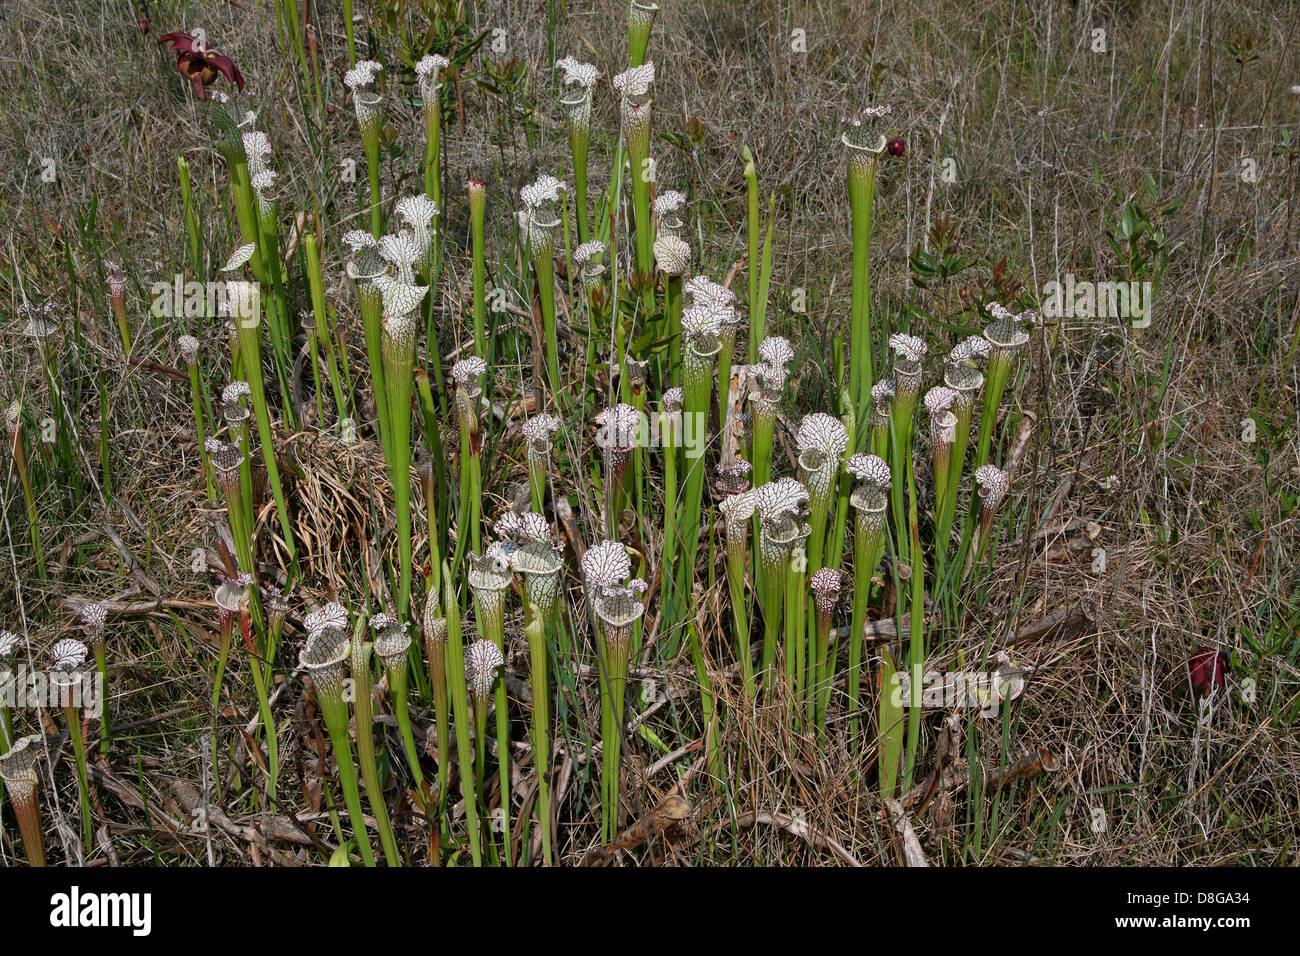 Carnivorous White-topped Pitcher Plants in Seepage bog Sarracenia leucophylla Florida USA - Stock Image